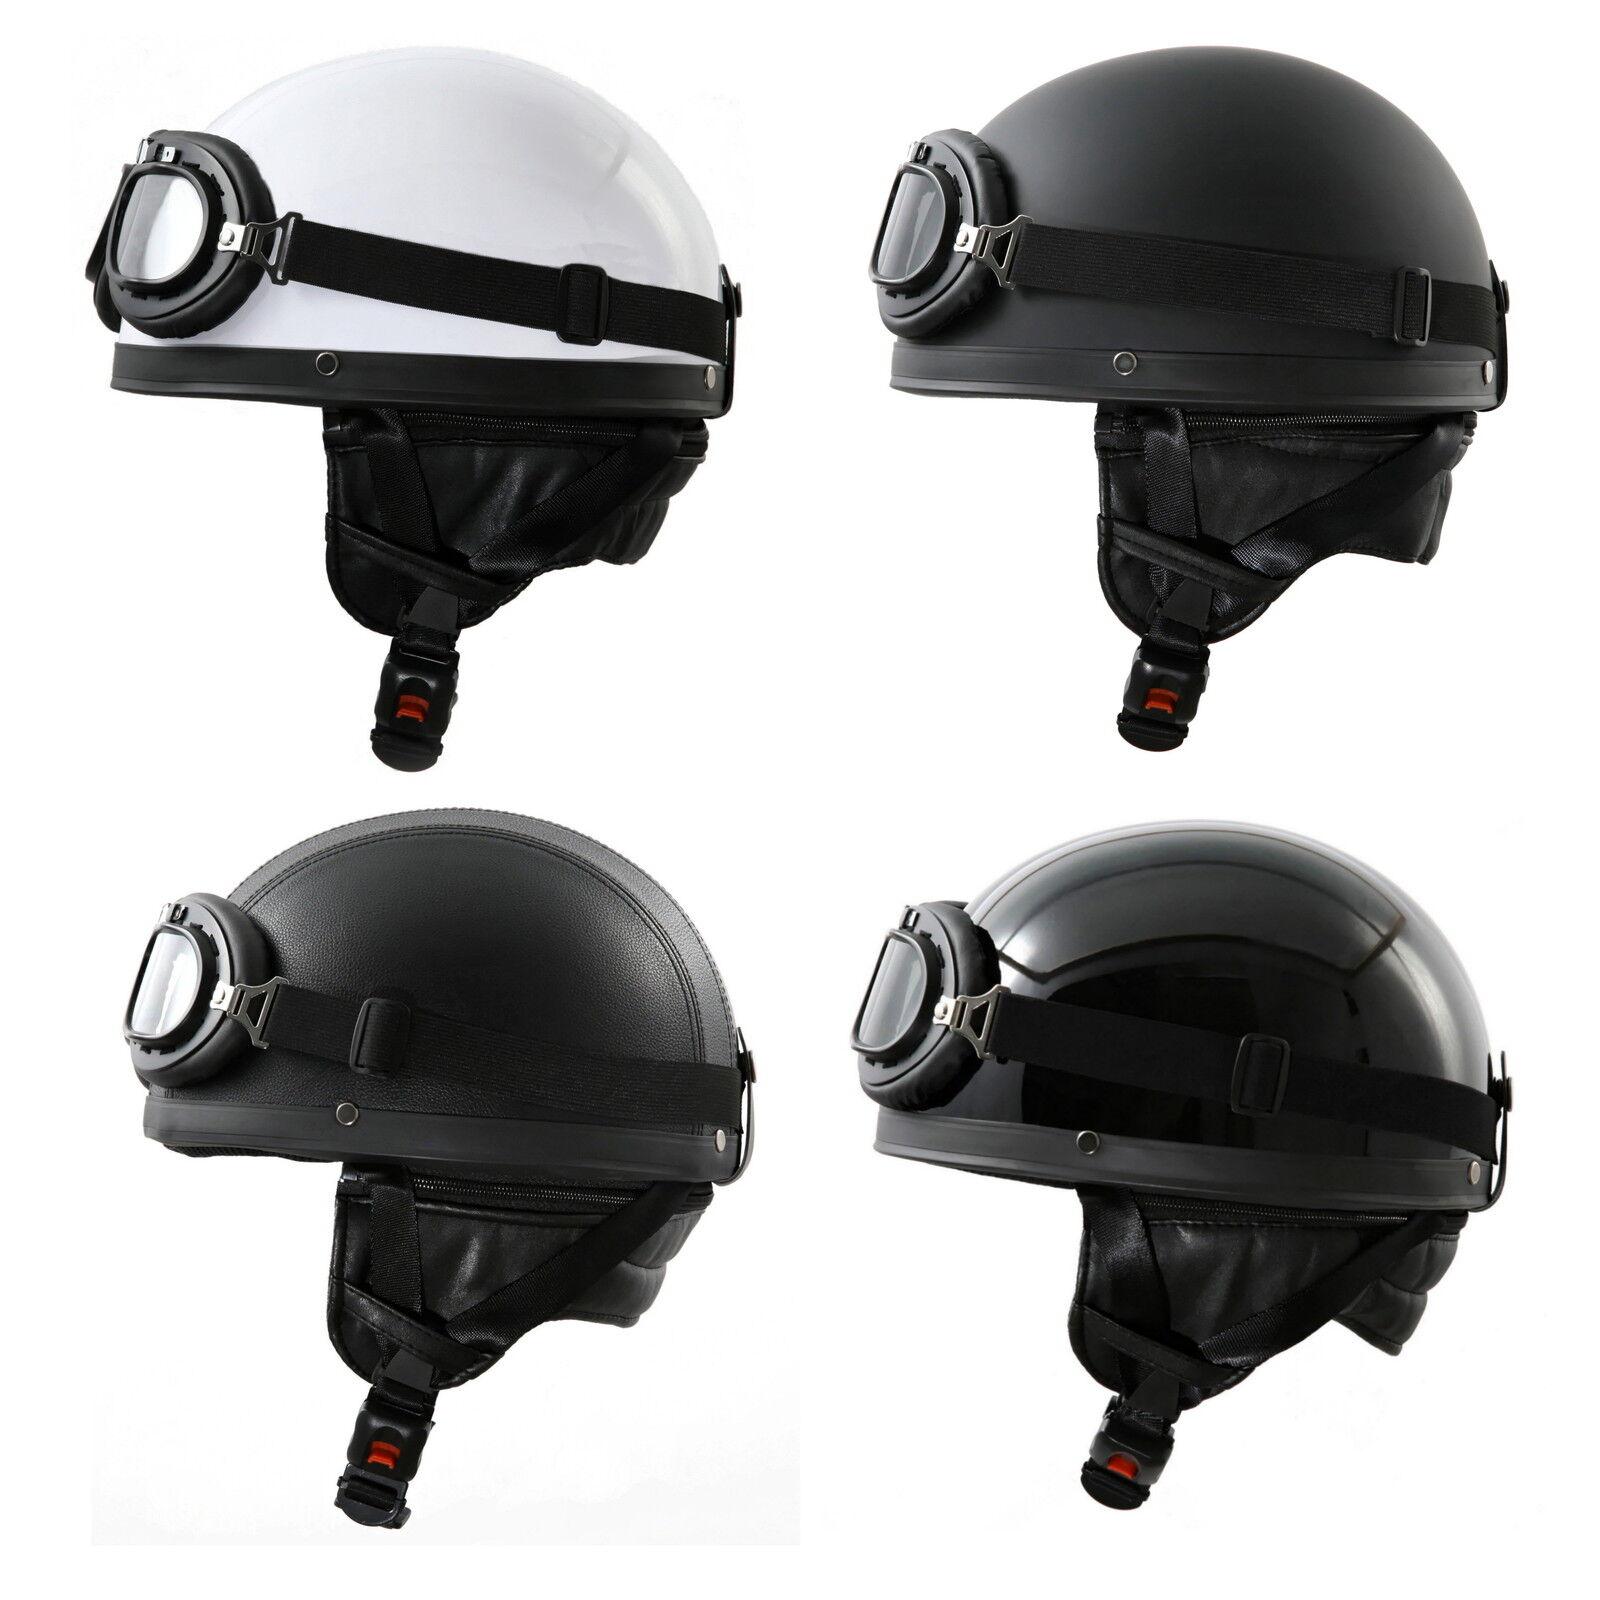 Retro Oldtimer Motorradhelm + Brille Motorrad Helm für DDR Moped B-Ware!